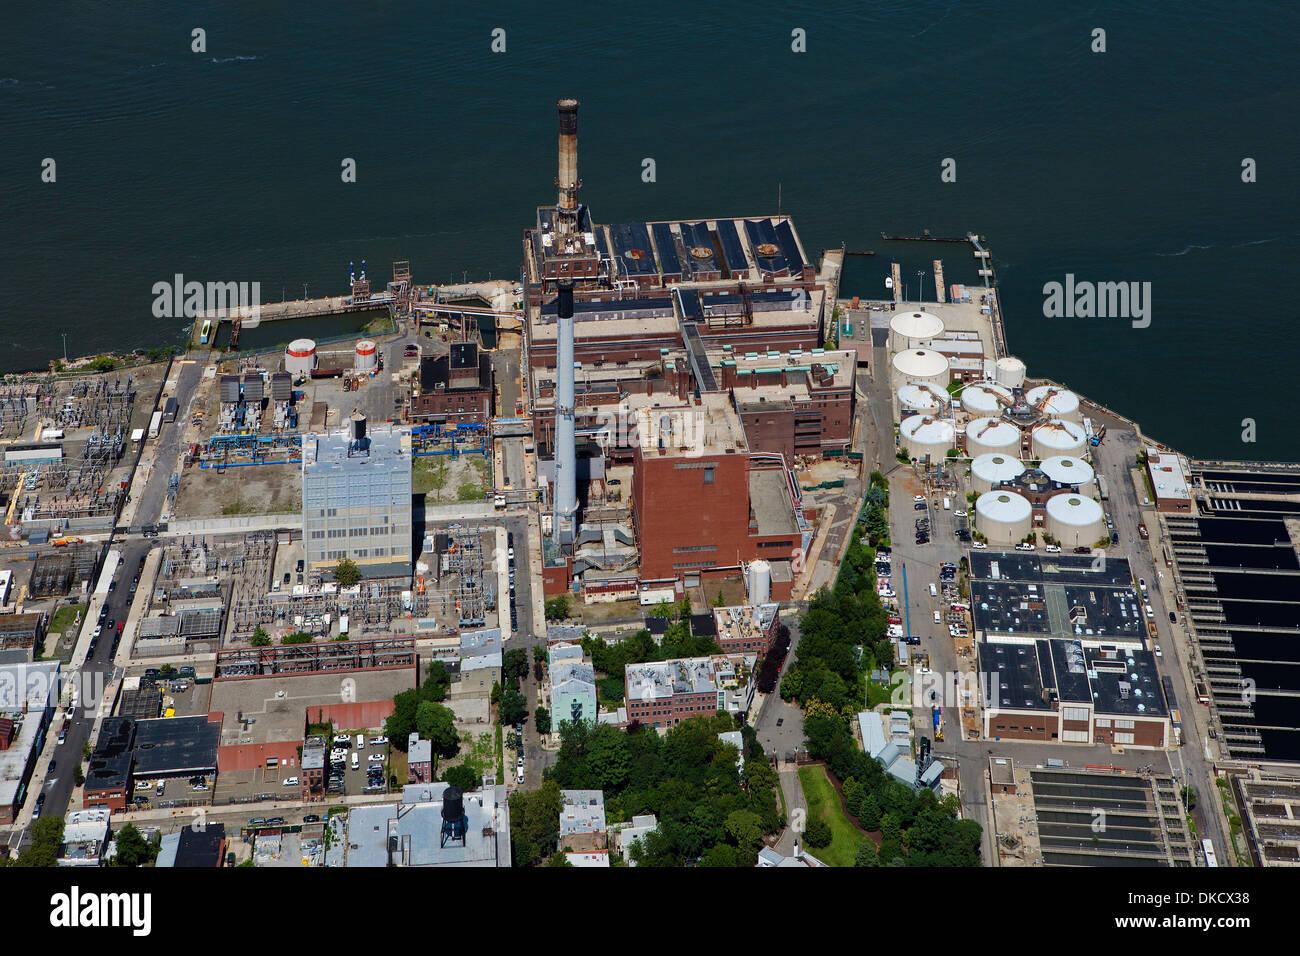 aerial photograph Brooklyn Navy Yard Cogeneration Facility, Brooklyn, New York - Stock Image